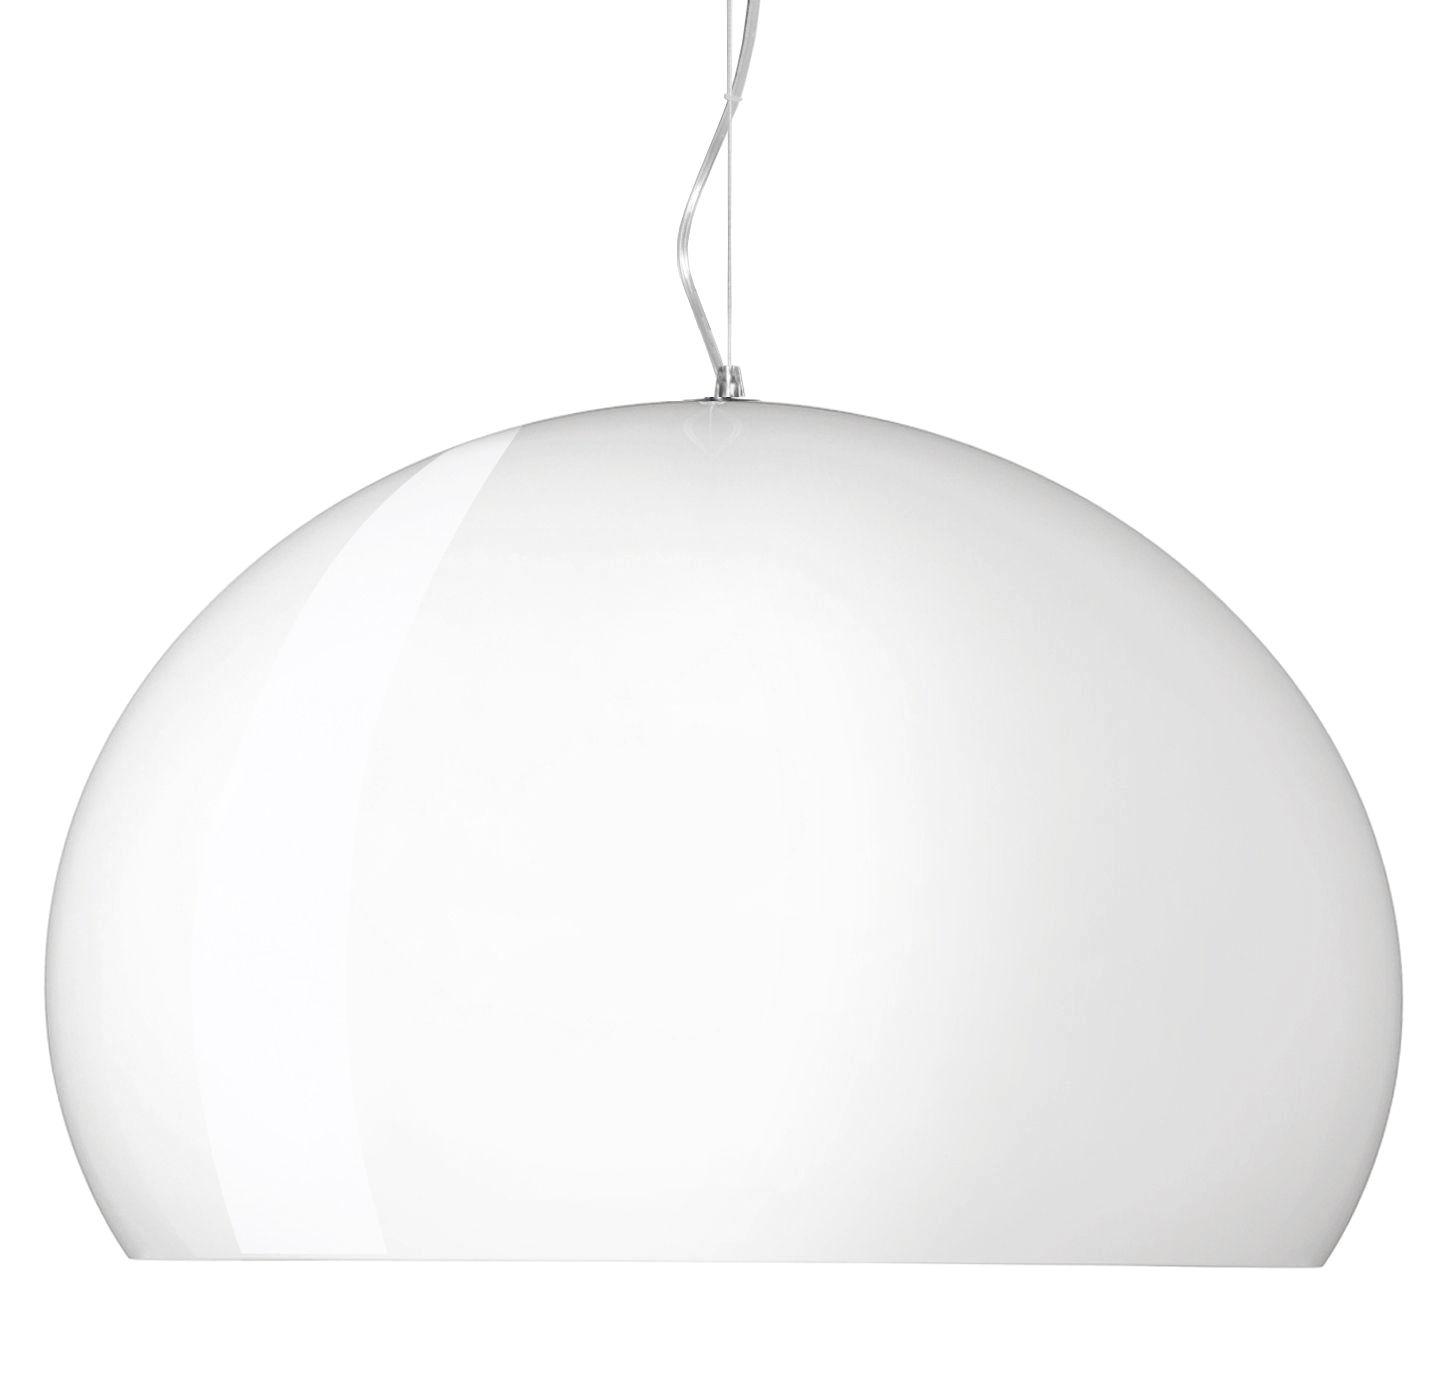 Lampe à suspension Big FL / Y - Ø 83 cm Blanc mat brillant Kartell Ferruccio Laviani 1